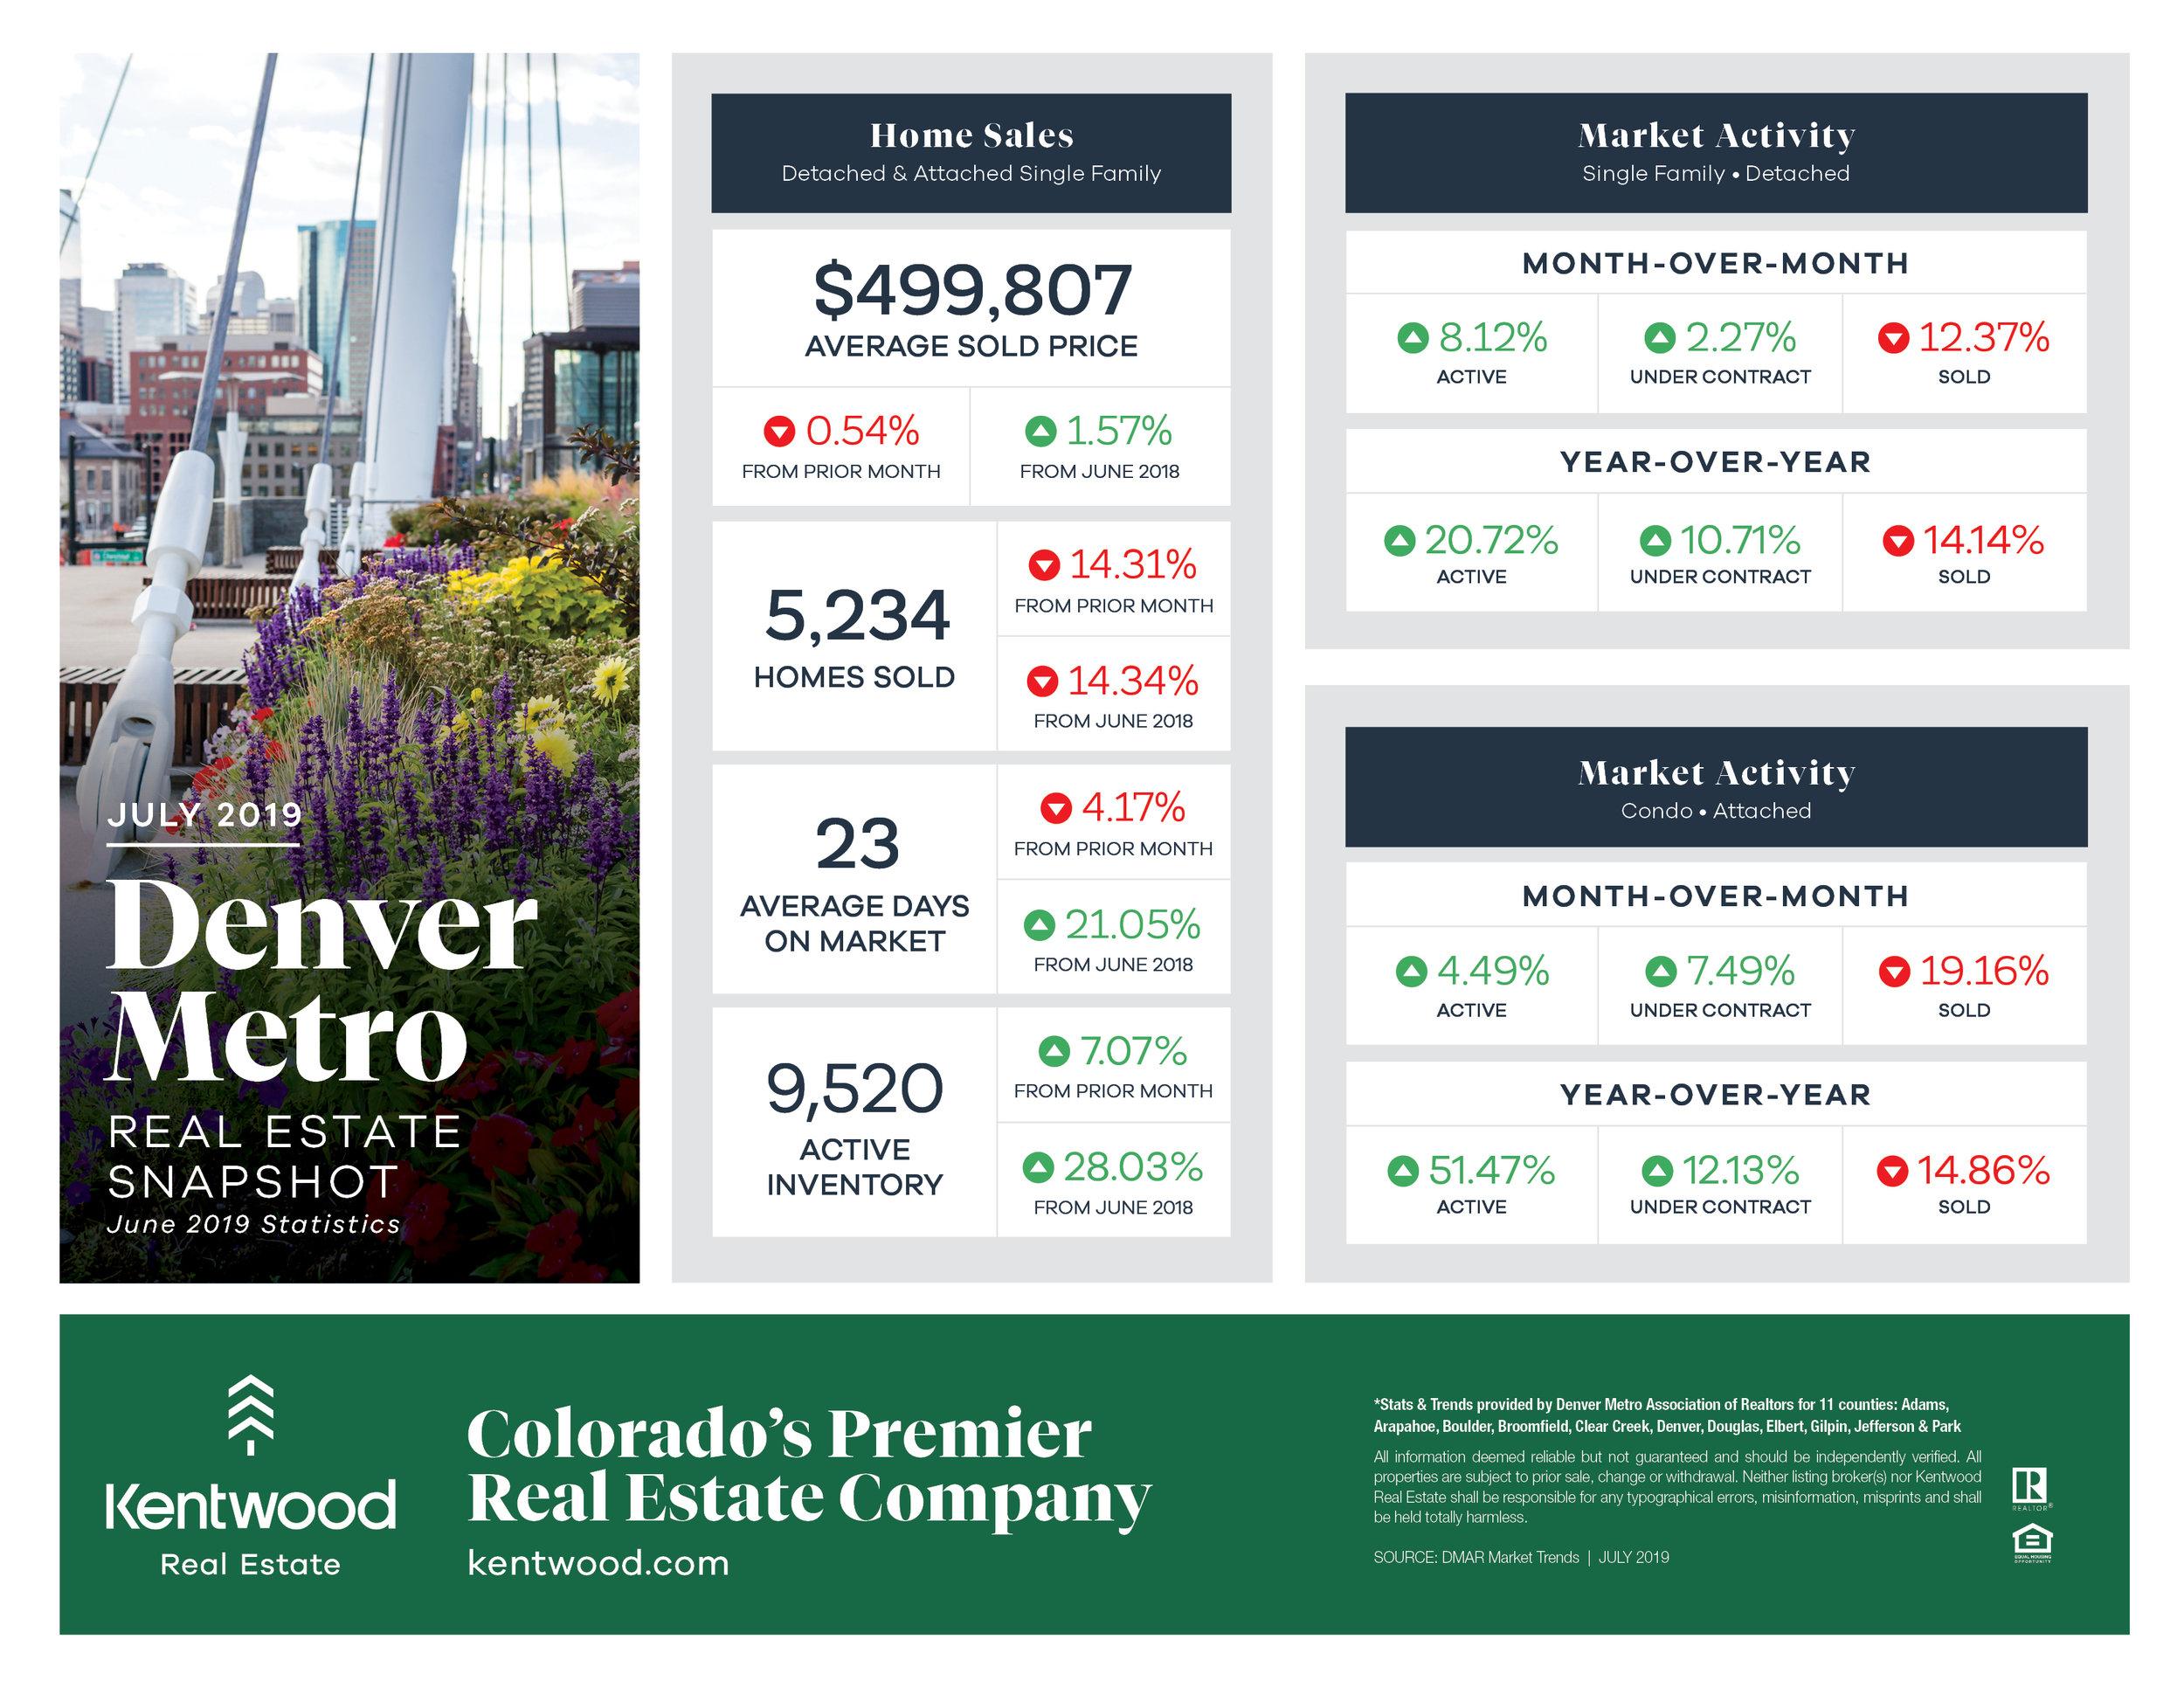 July_Denver_Metro_StatsUpdatedBranding.jpg